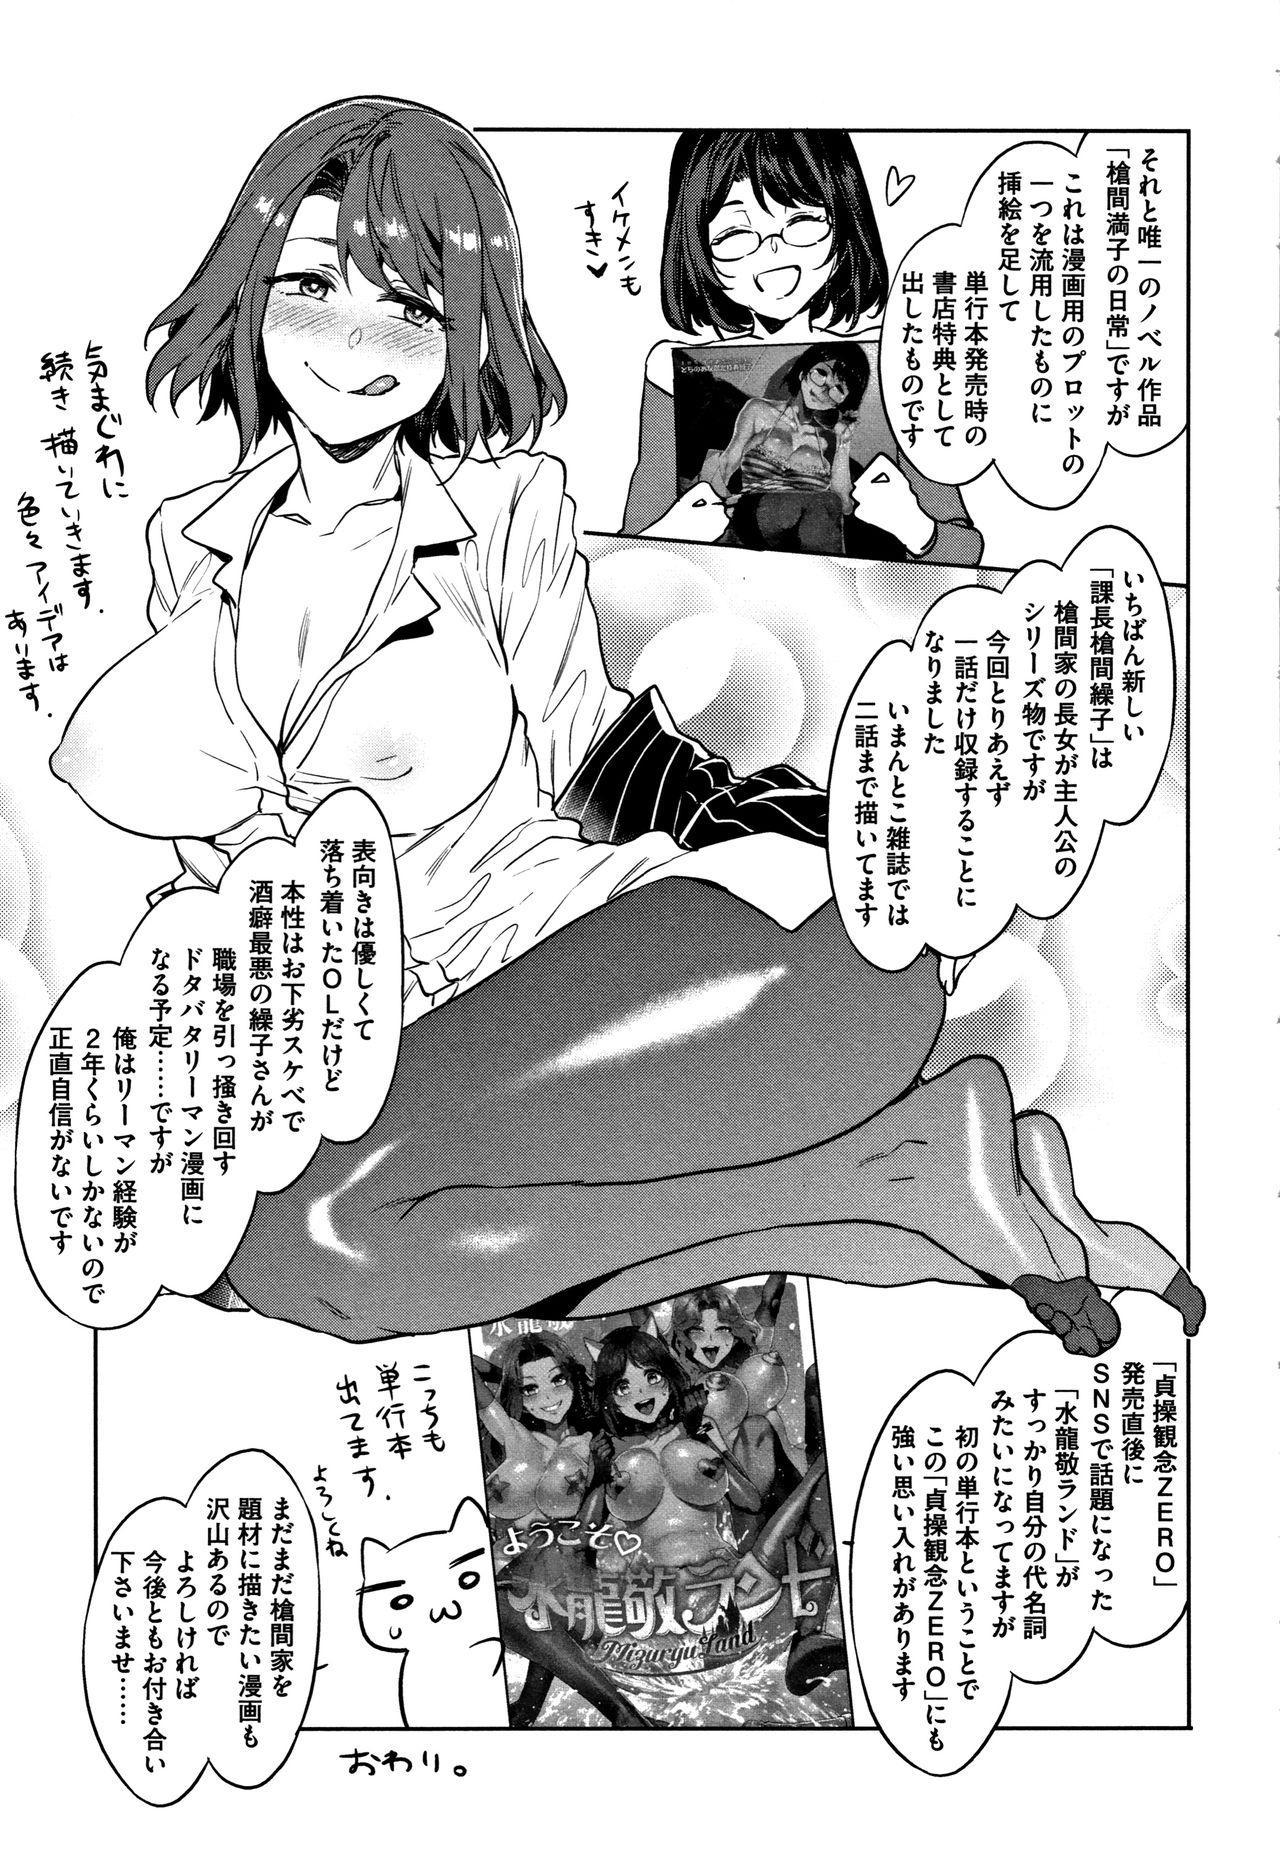 Teisou Kannen ZERO Shinsouban 1 202